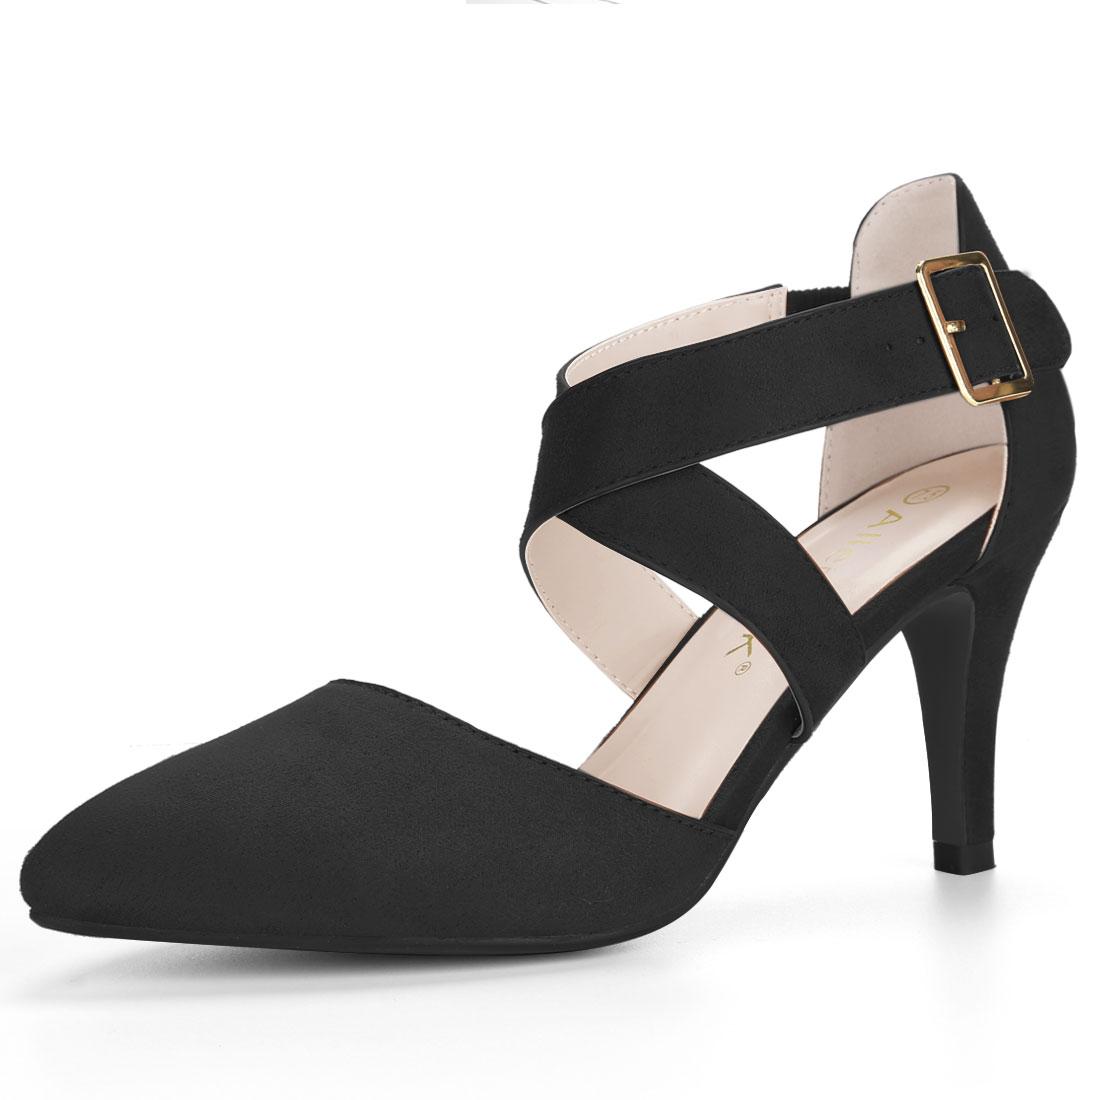 Allegra K Women's Crisscross Straps Stiletto Heel Ankle Strap Pumps Black US 8